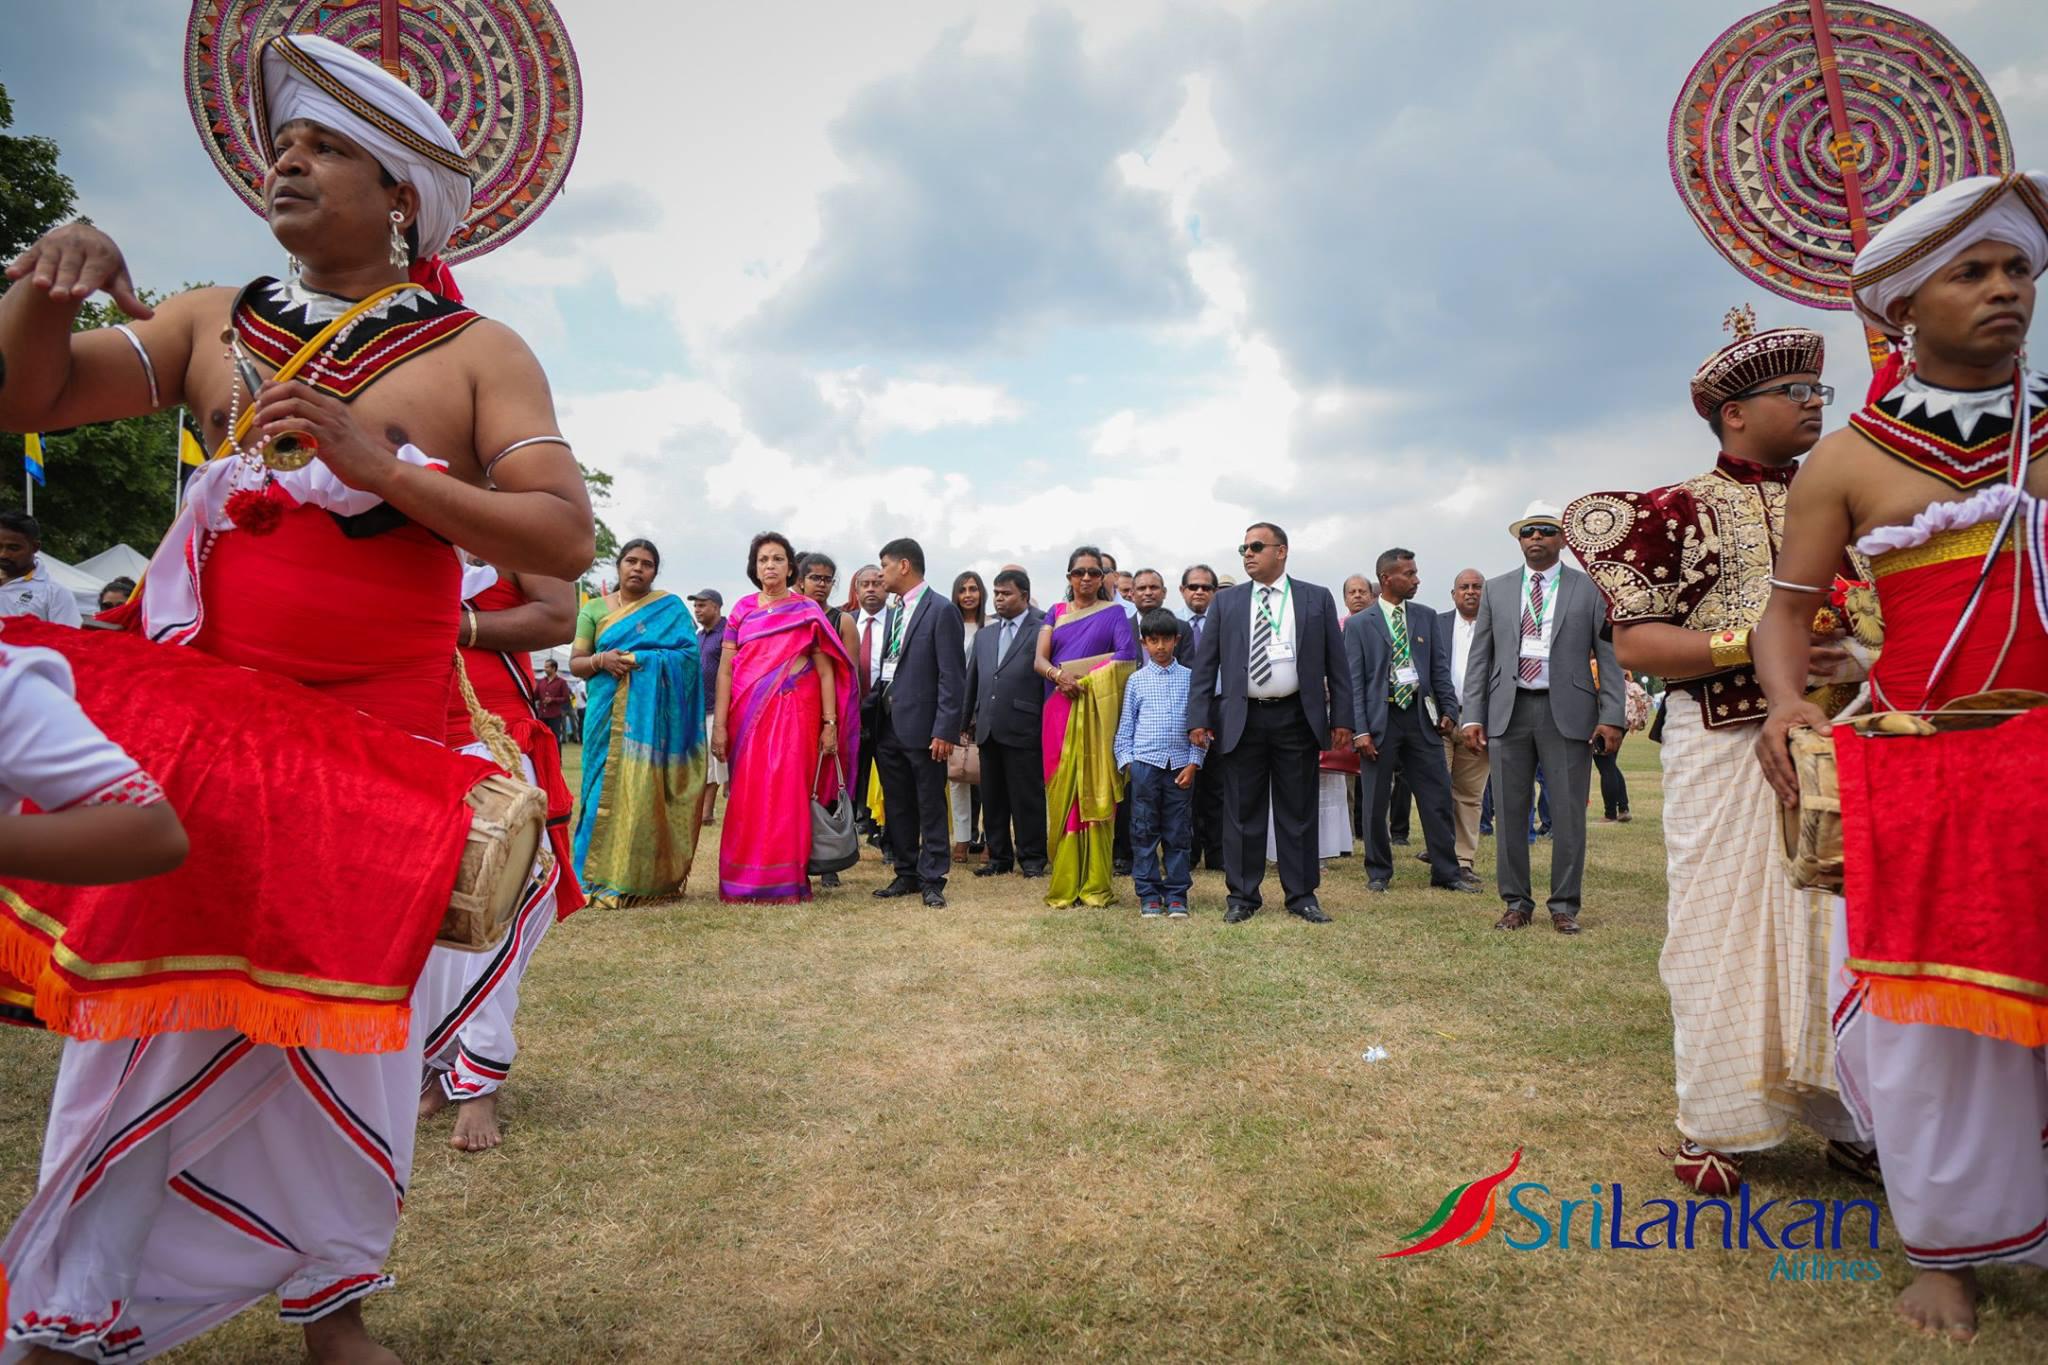 Sri-Lankan-airlines-cricket-festival-london-2017-natalia-smith--photography-15.jpg